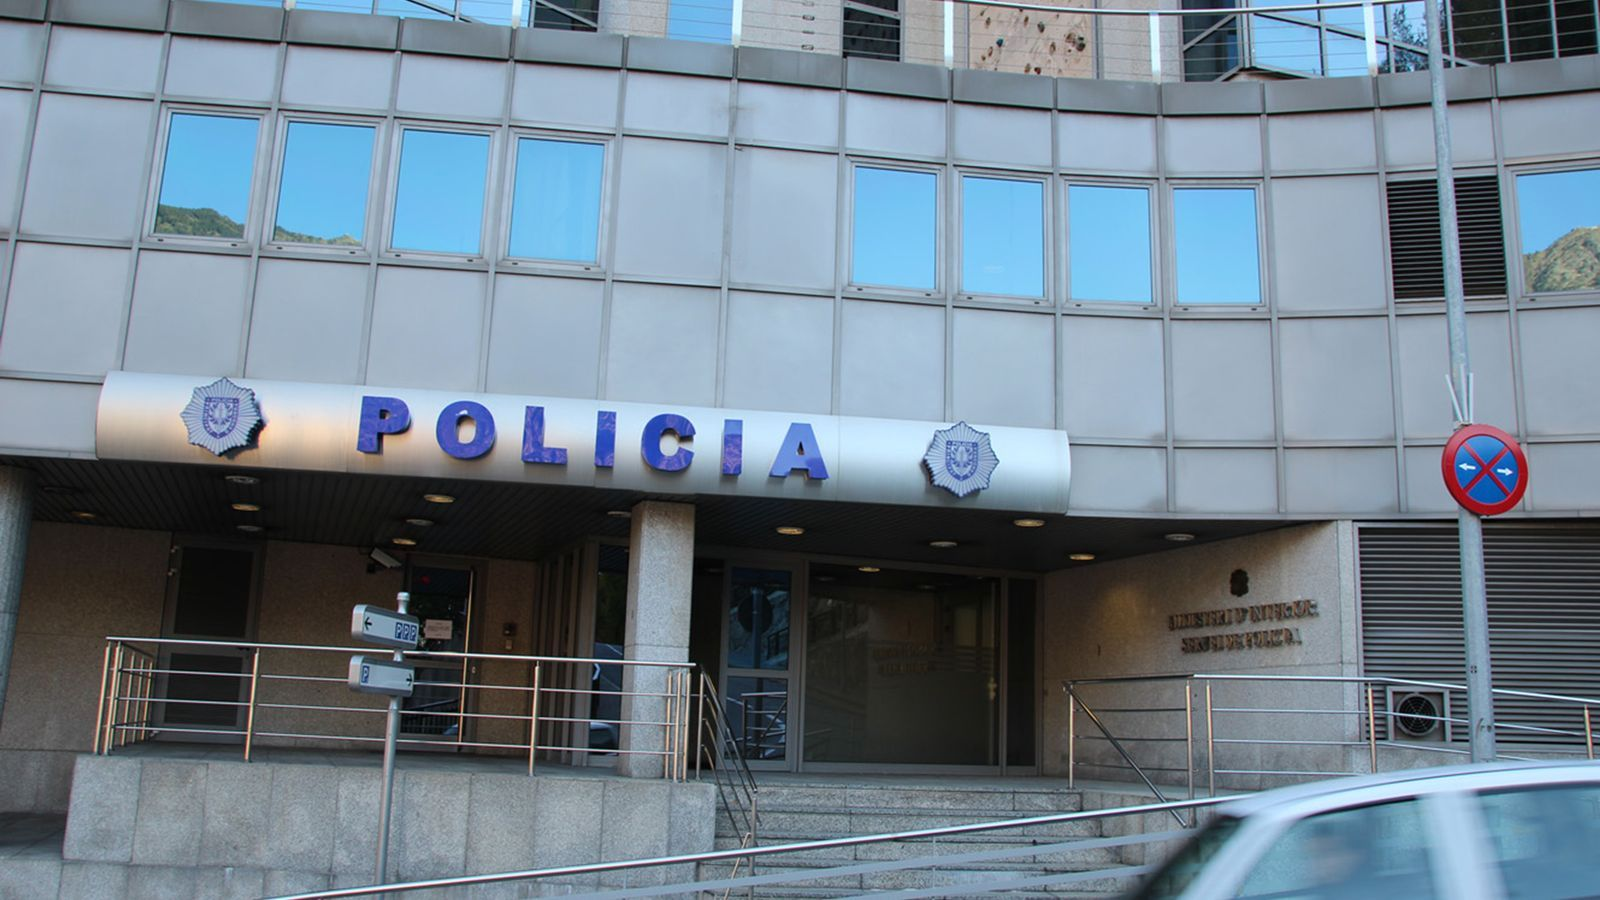 La policia va detenir 17 persones la setmana passada. / ARXIU ANA